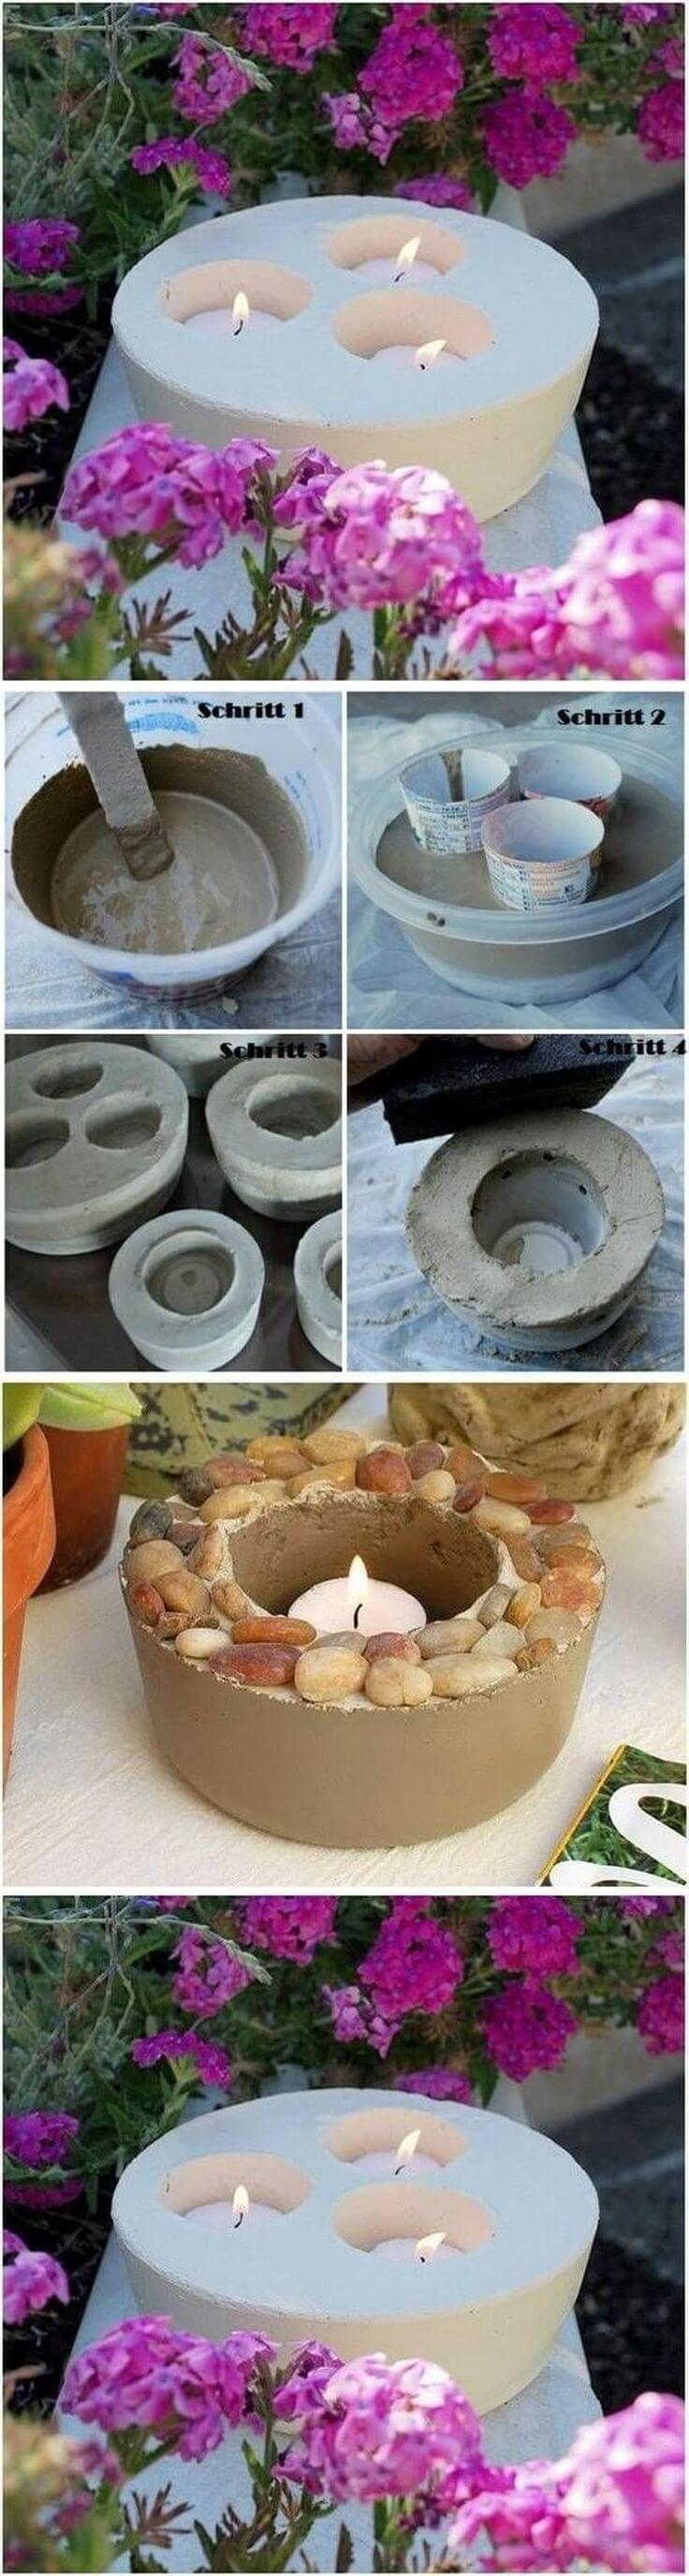 DIY Concrete Candle Motive for the Backyard